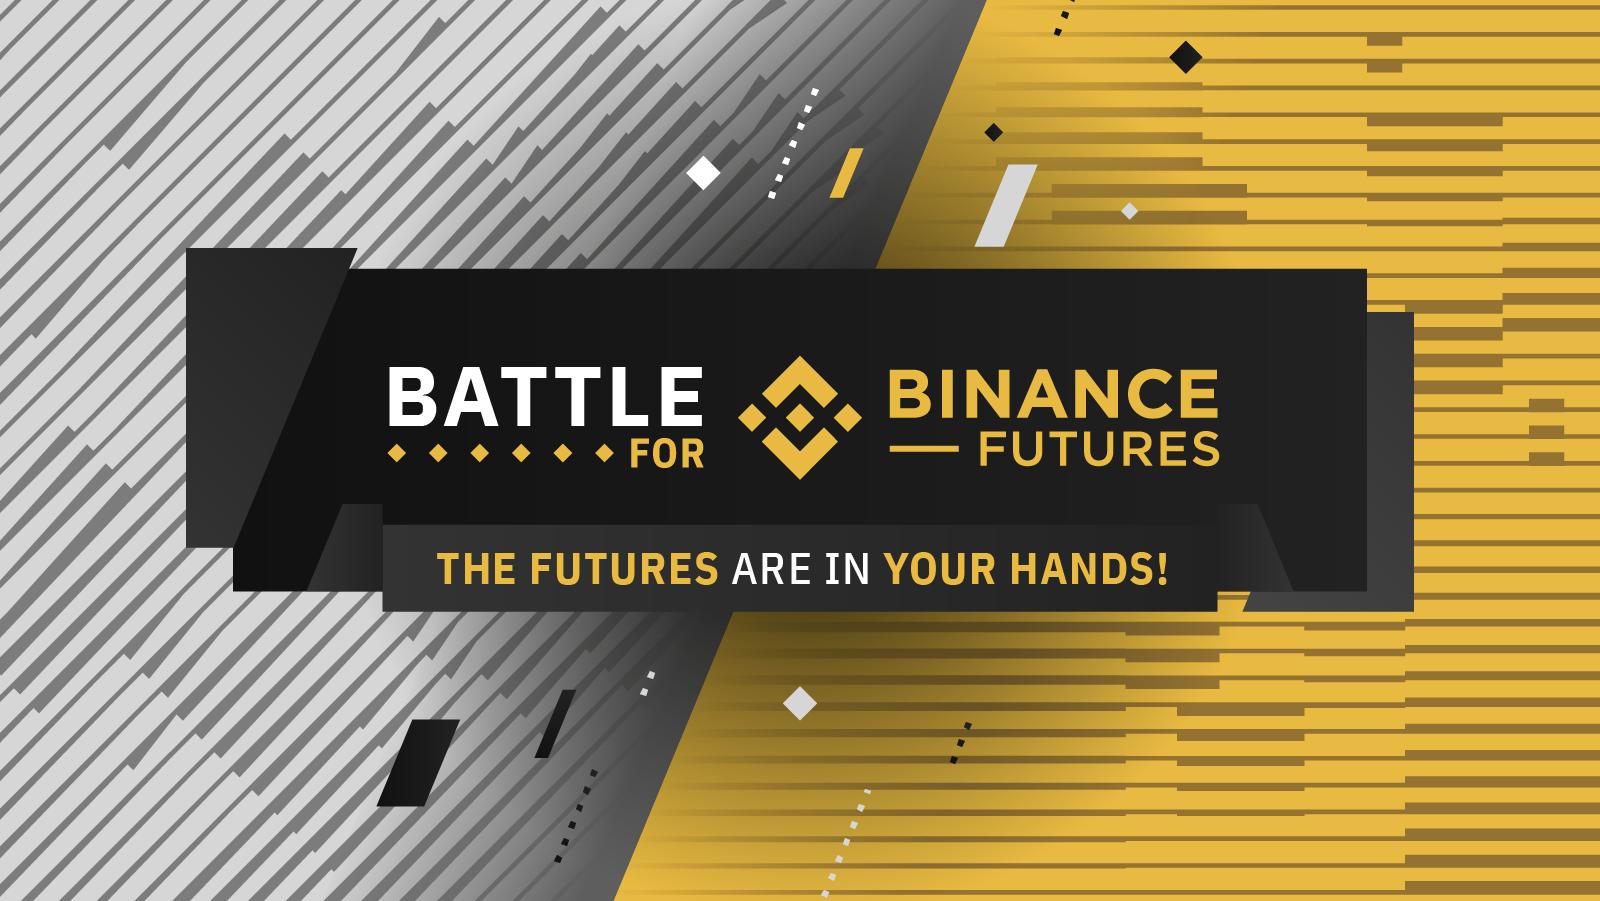 Battle for Binance Futures: Everyone Wins! | Binance Blog